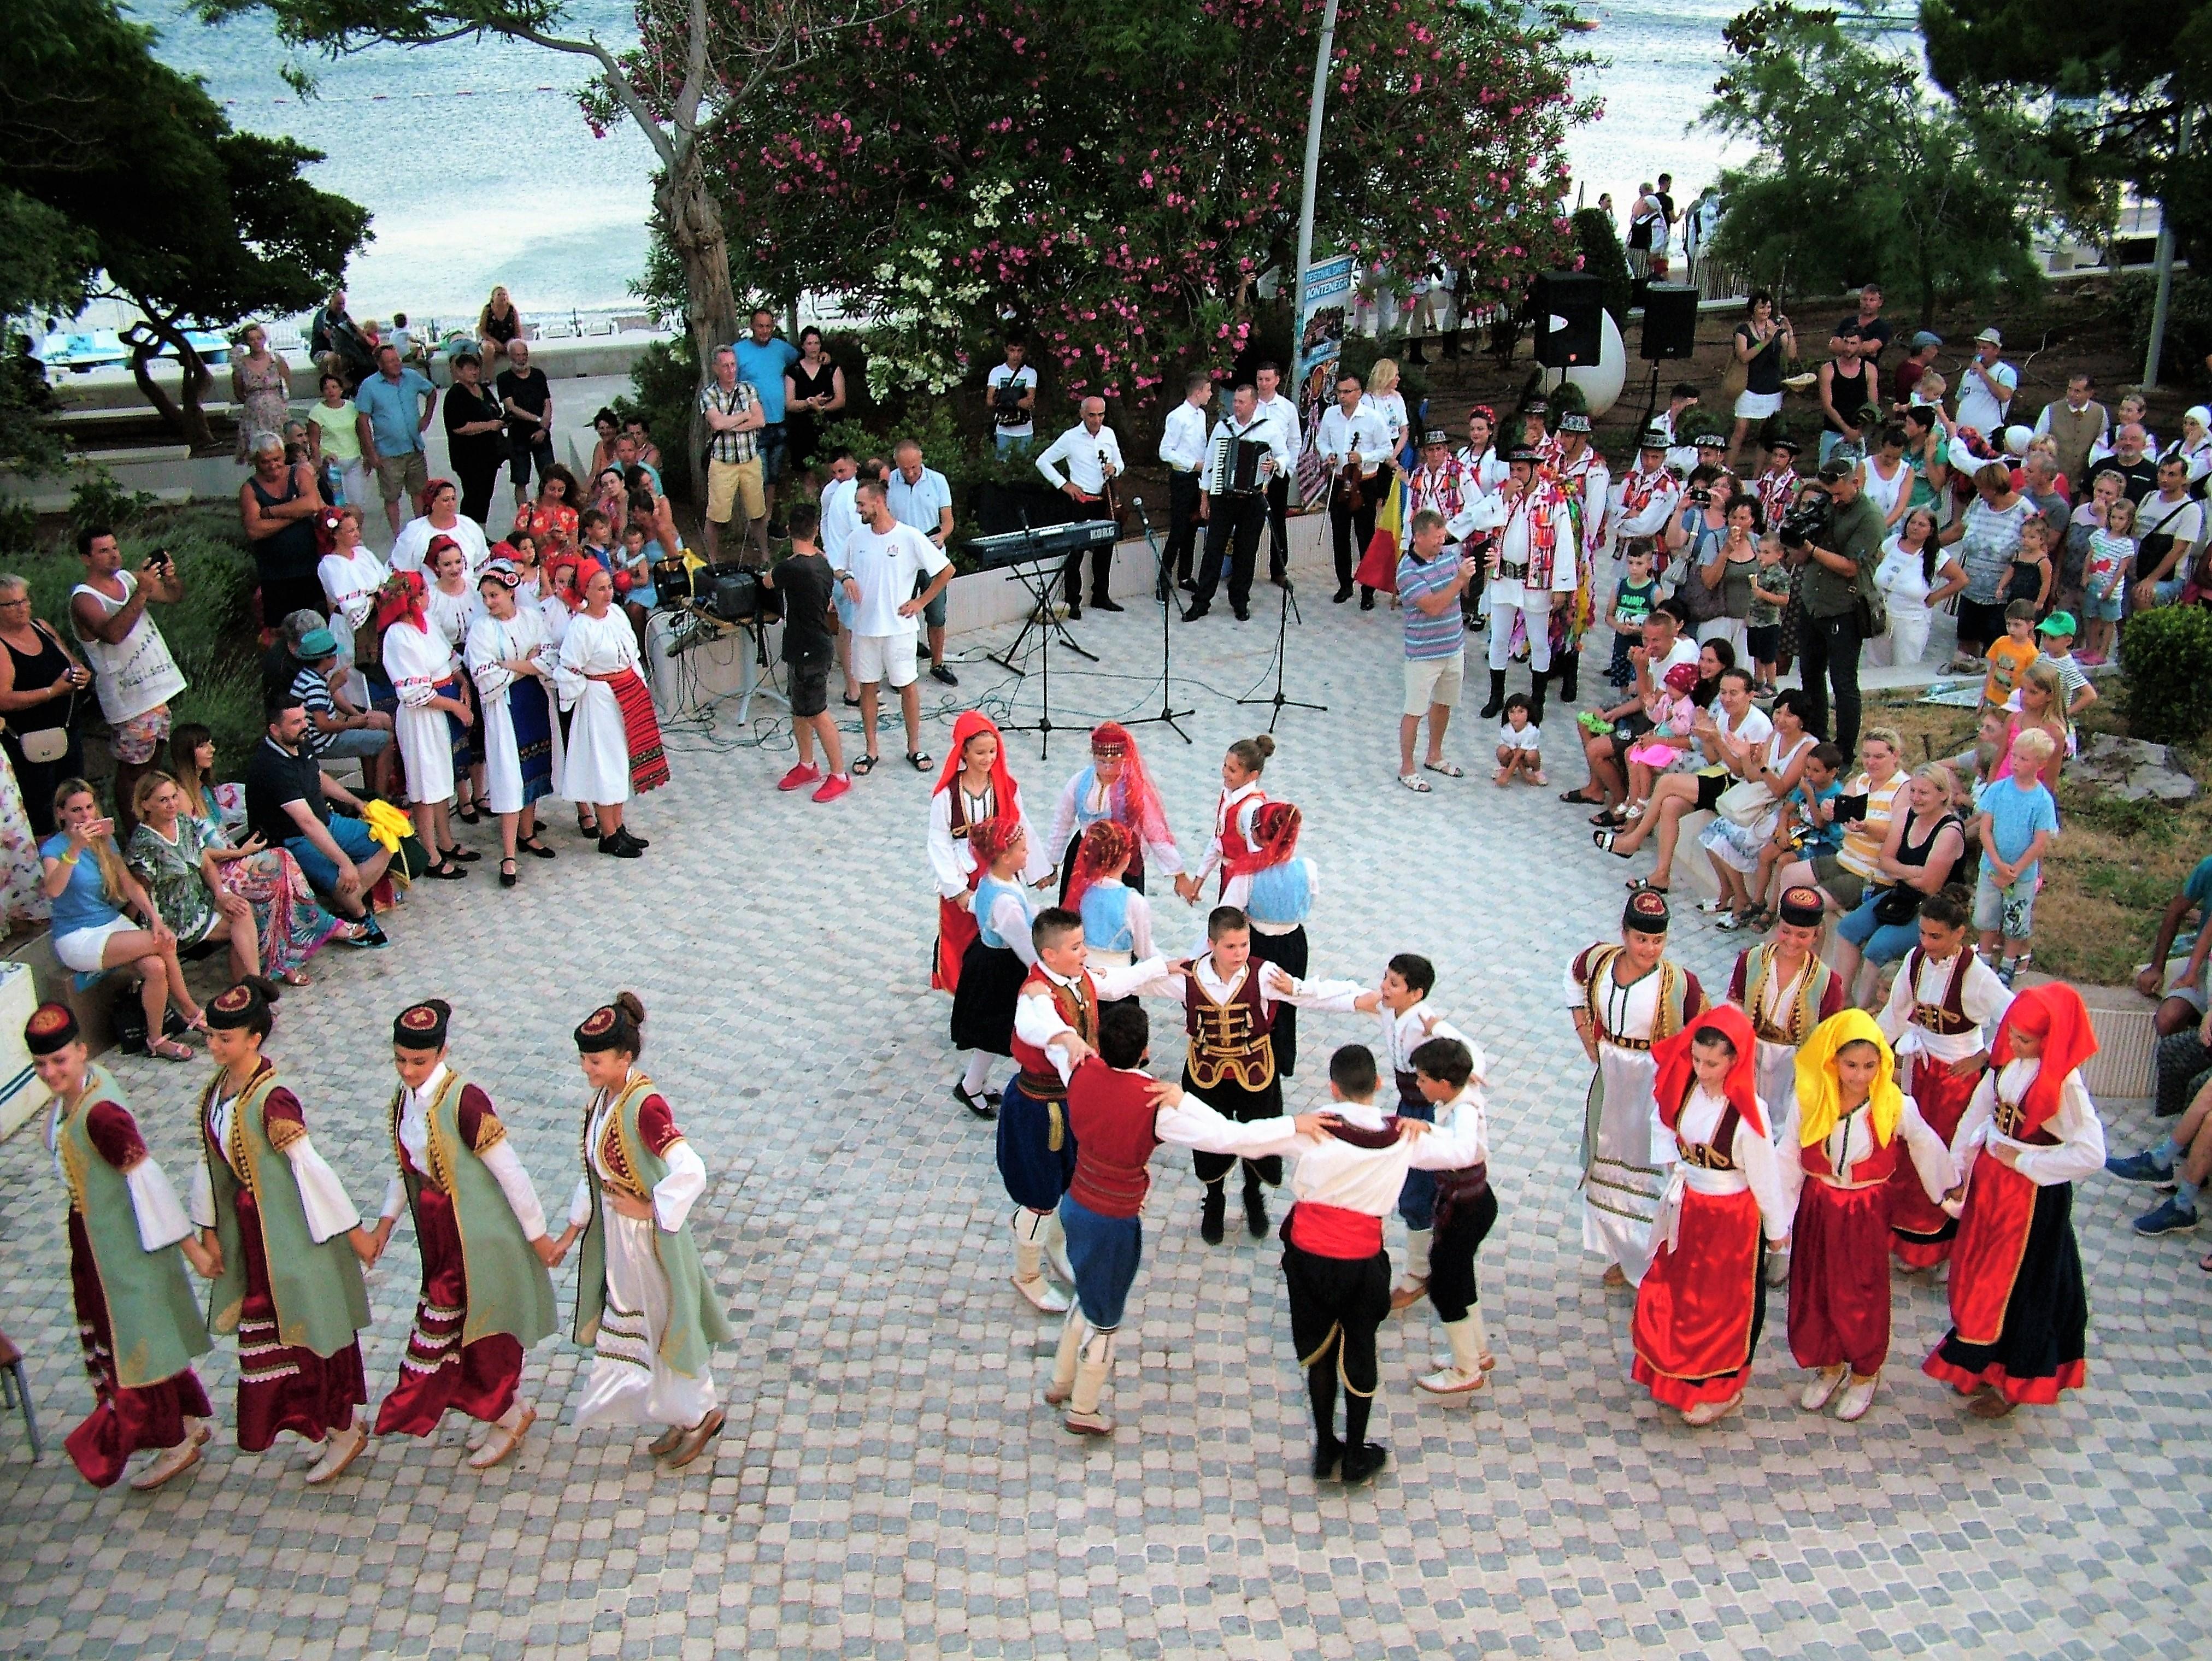 medjunarodni folklorni festival 2019 petrovac